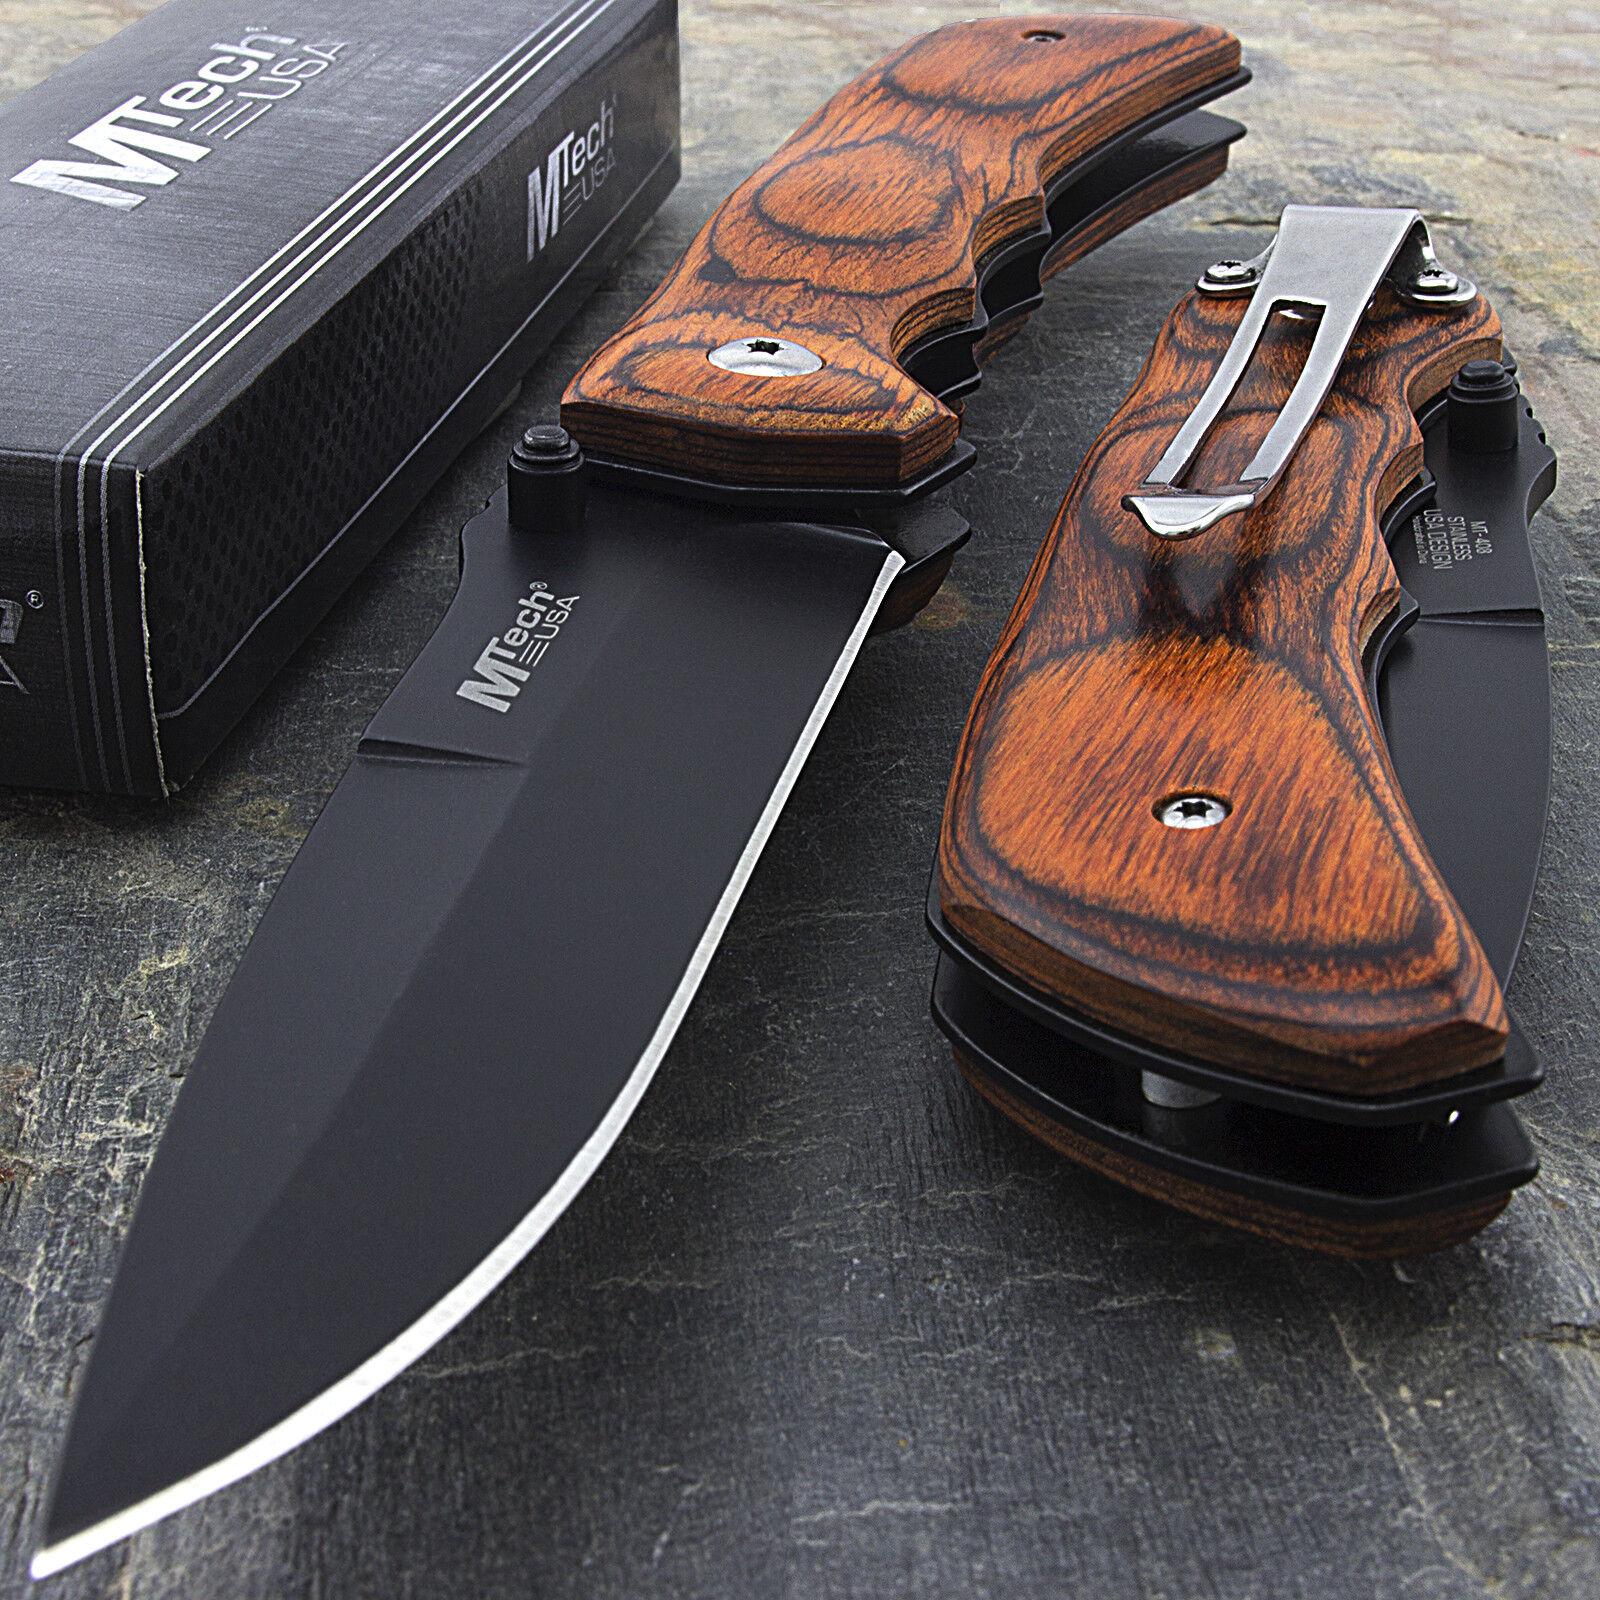 "Knife - 7.75"" MTECH USA RED WOOD SPRING ASSISTED FOLDING POCKET KNIFE Blade Open Assist"